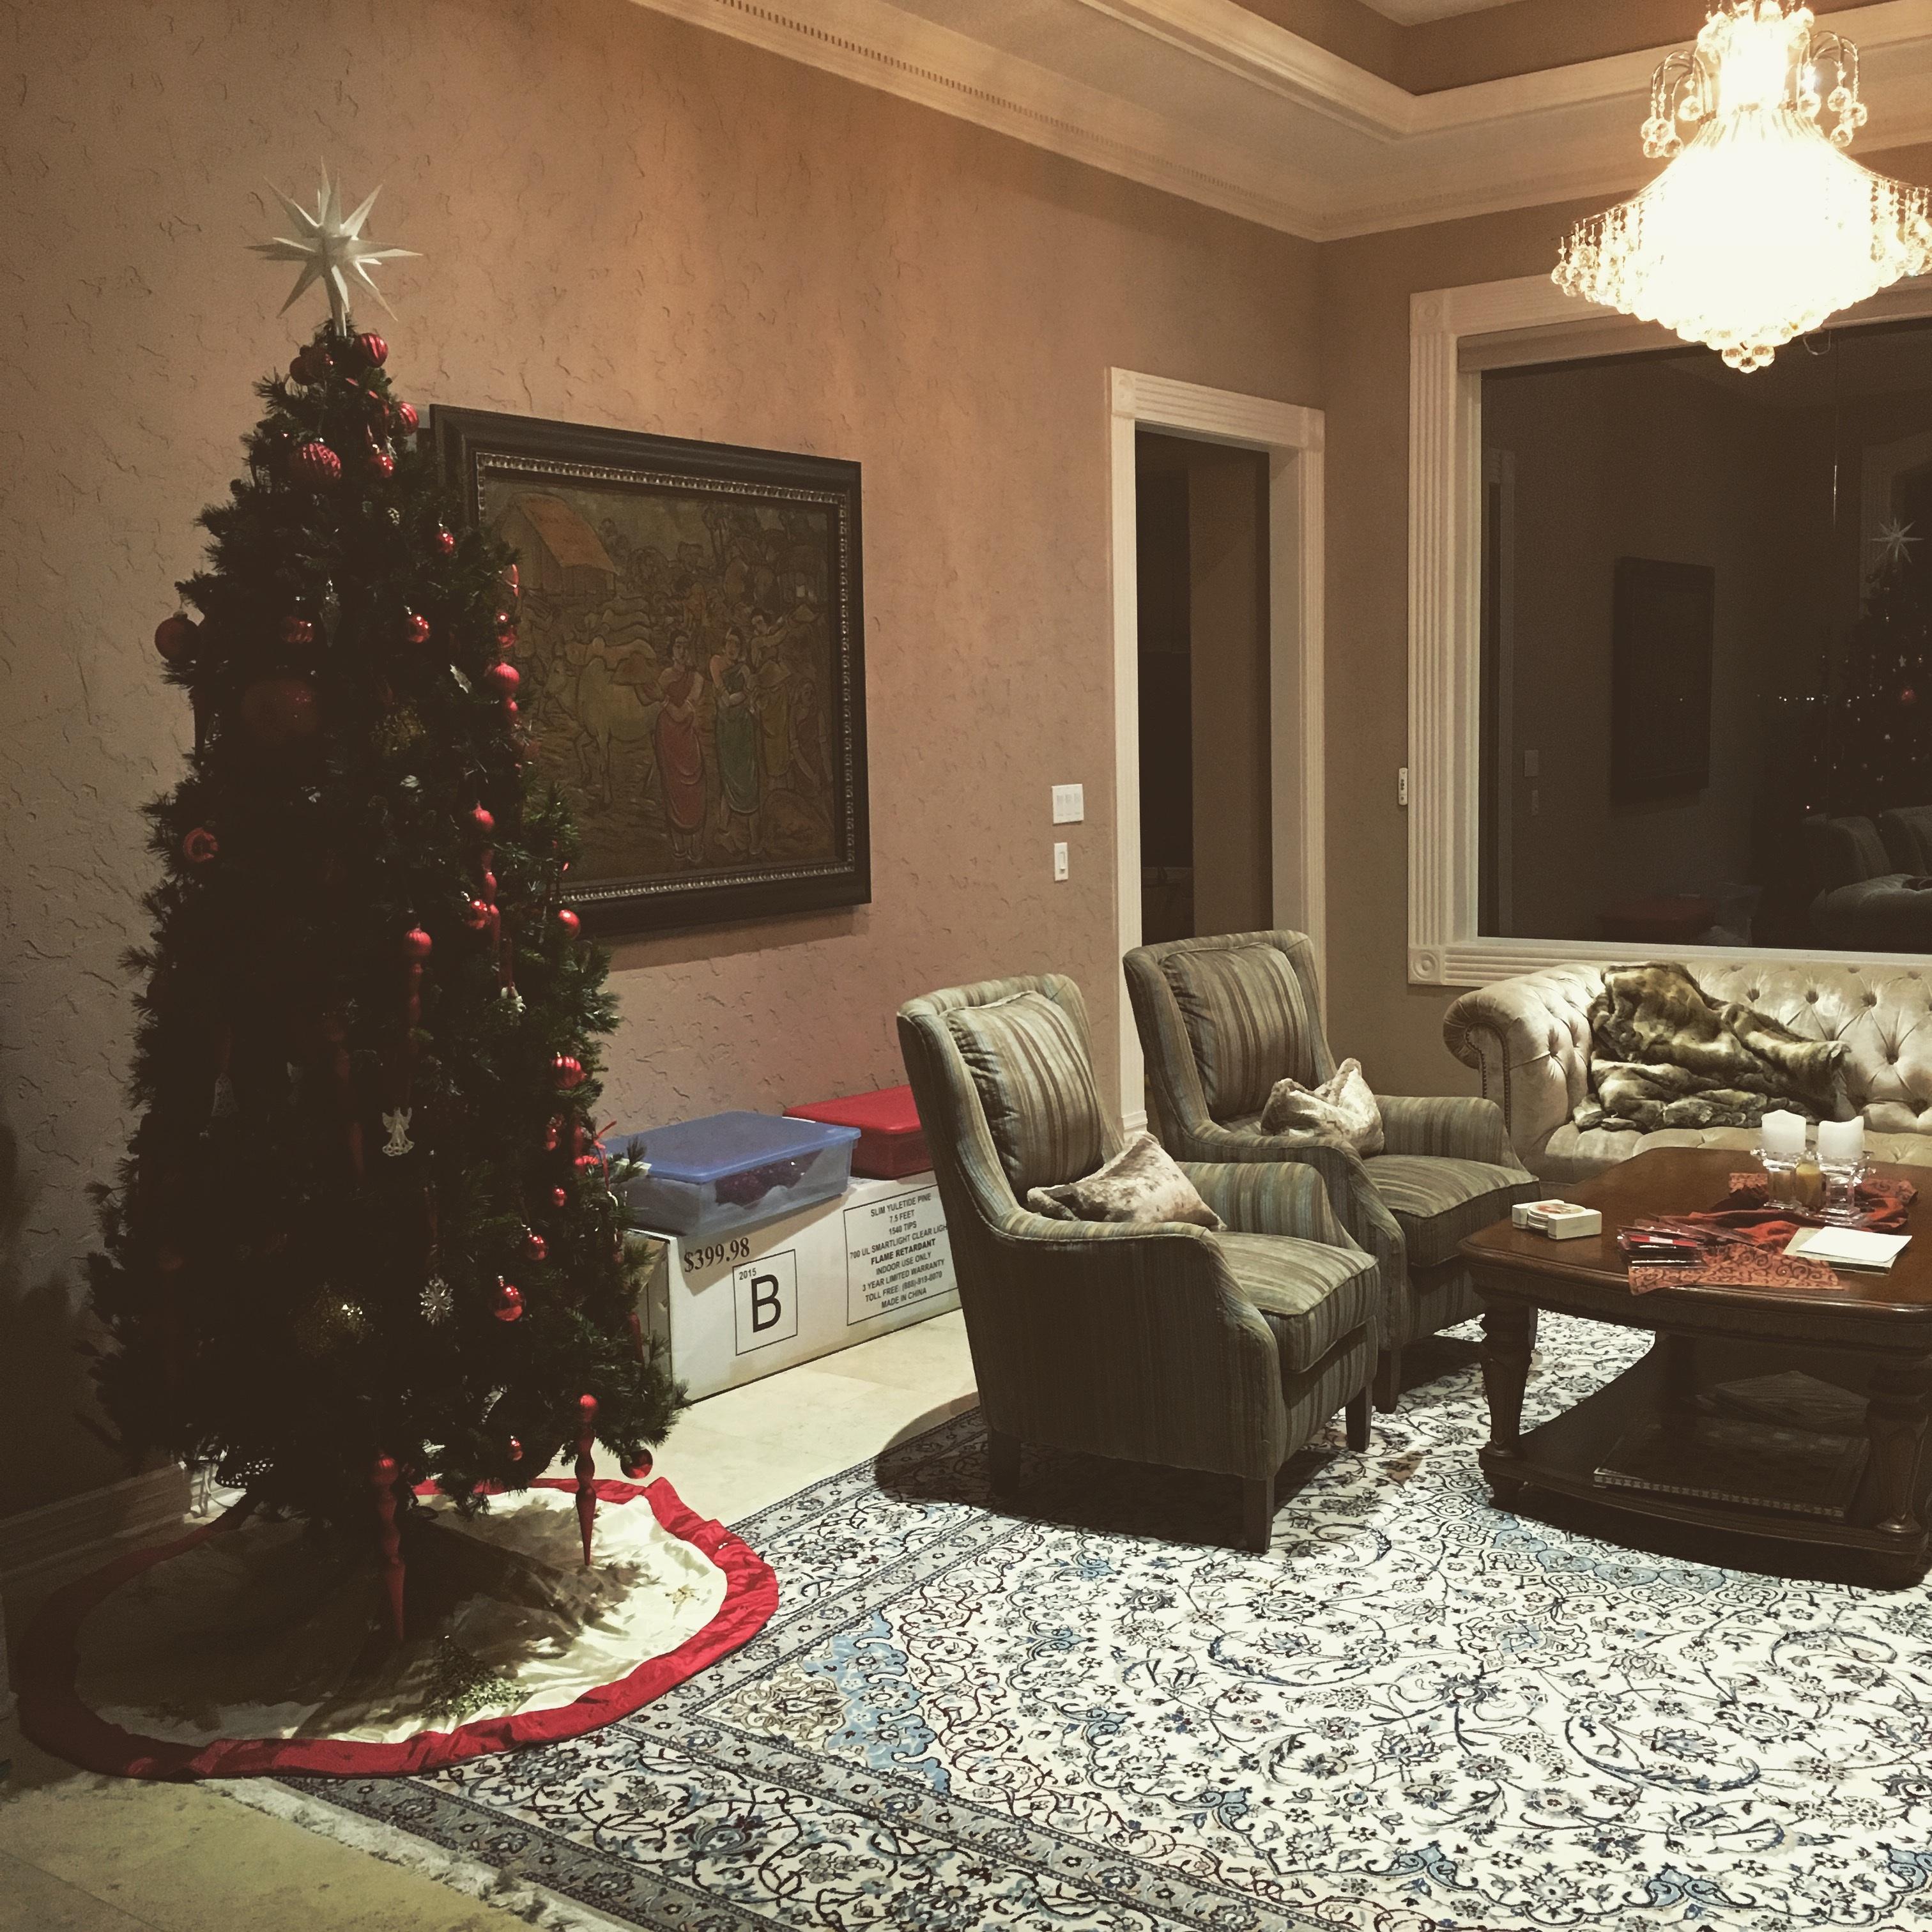 Living Room Christmas House Decorations Inside.Free Images House Floor Home Living Room Christmas